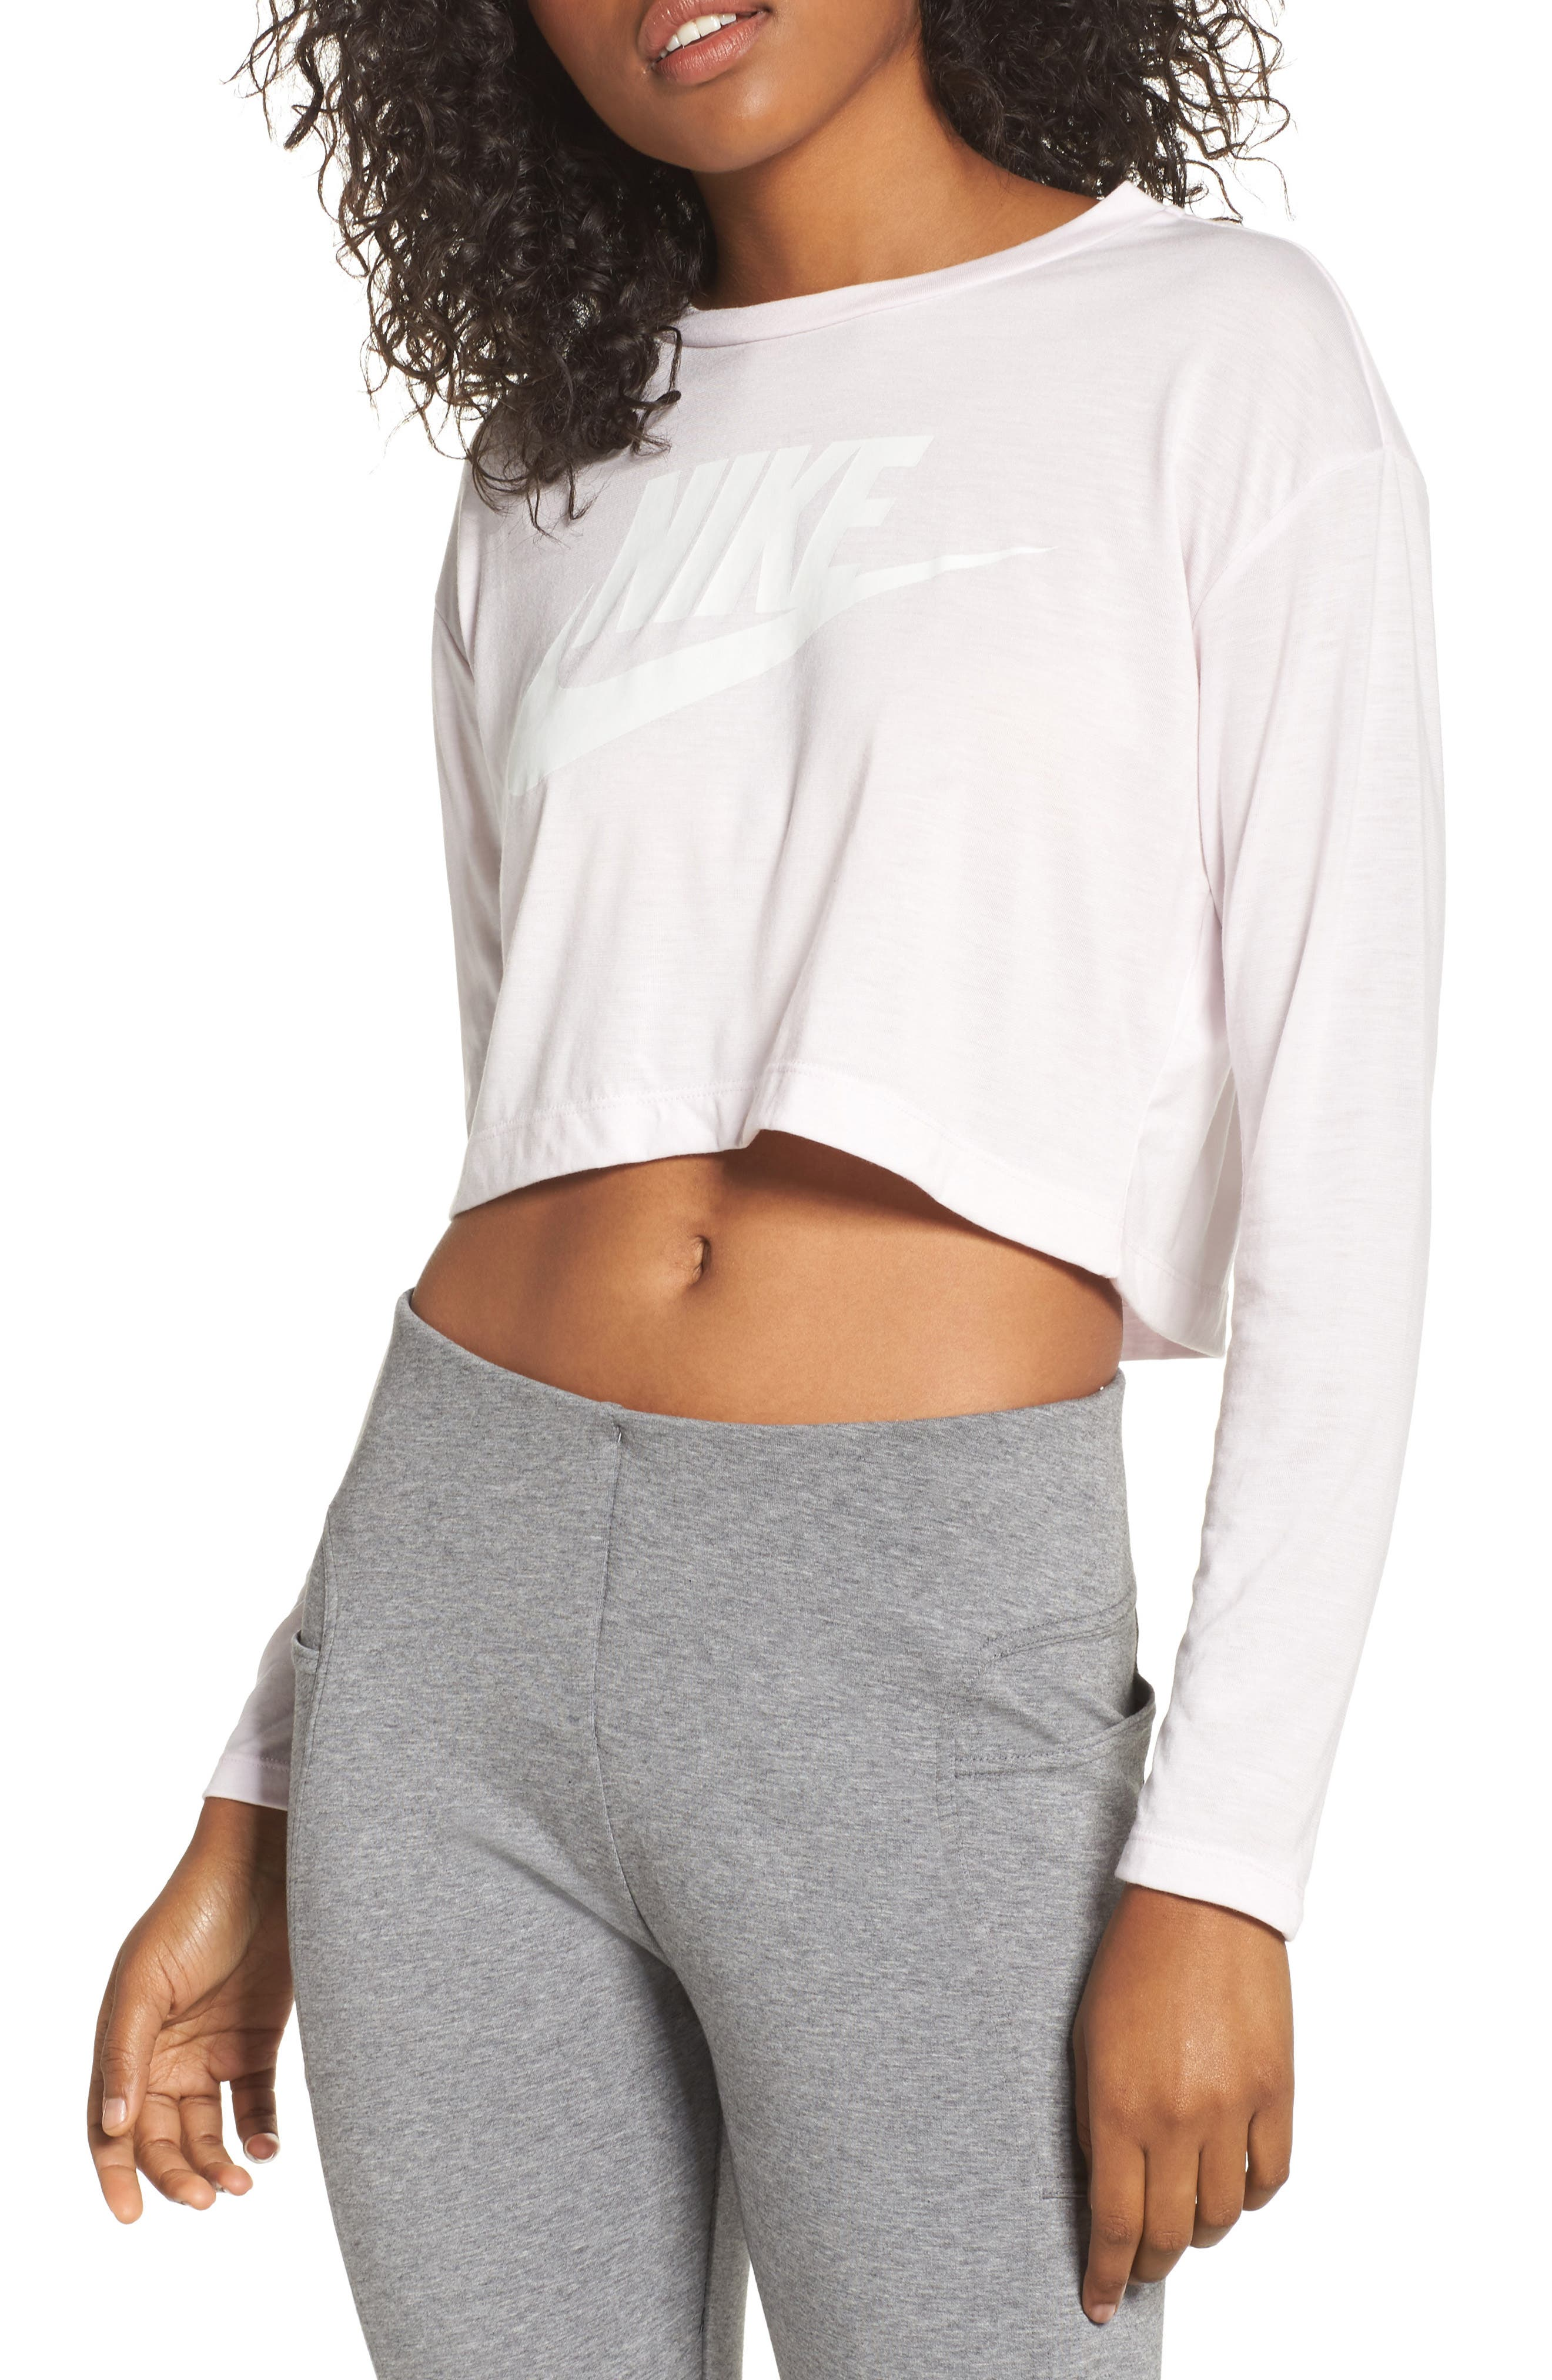 Sportswear Graphic Crop Tee,                             Main thumbnail 1, color,                             Pearl Pink/ Pearl Pink/ Sail